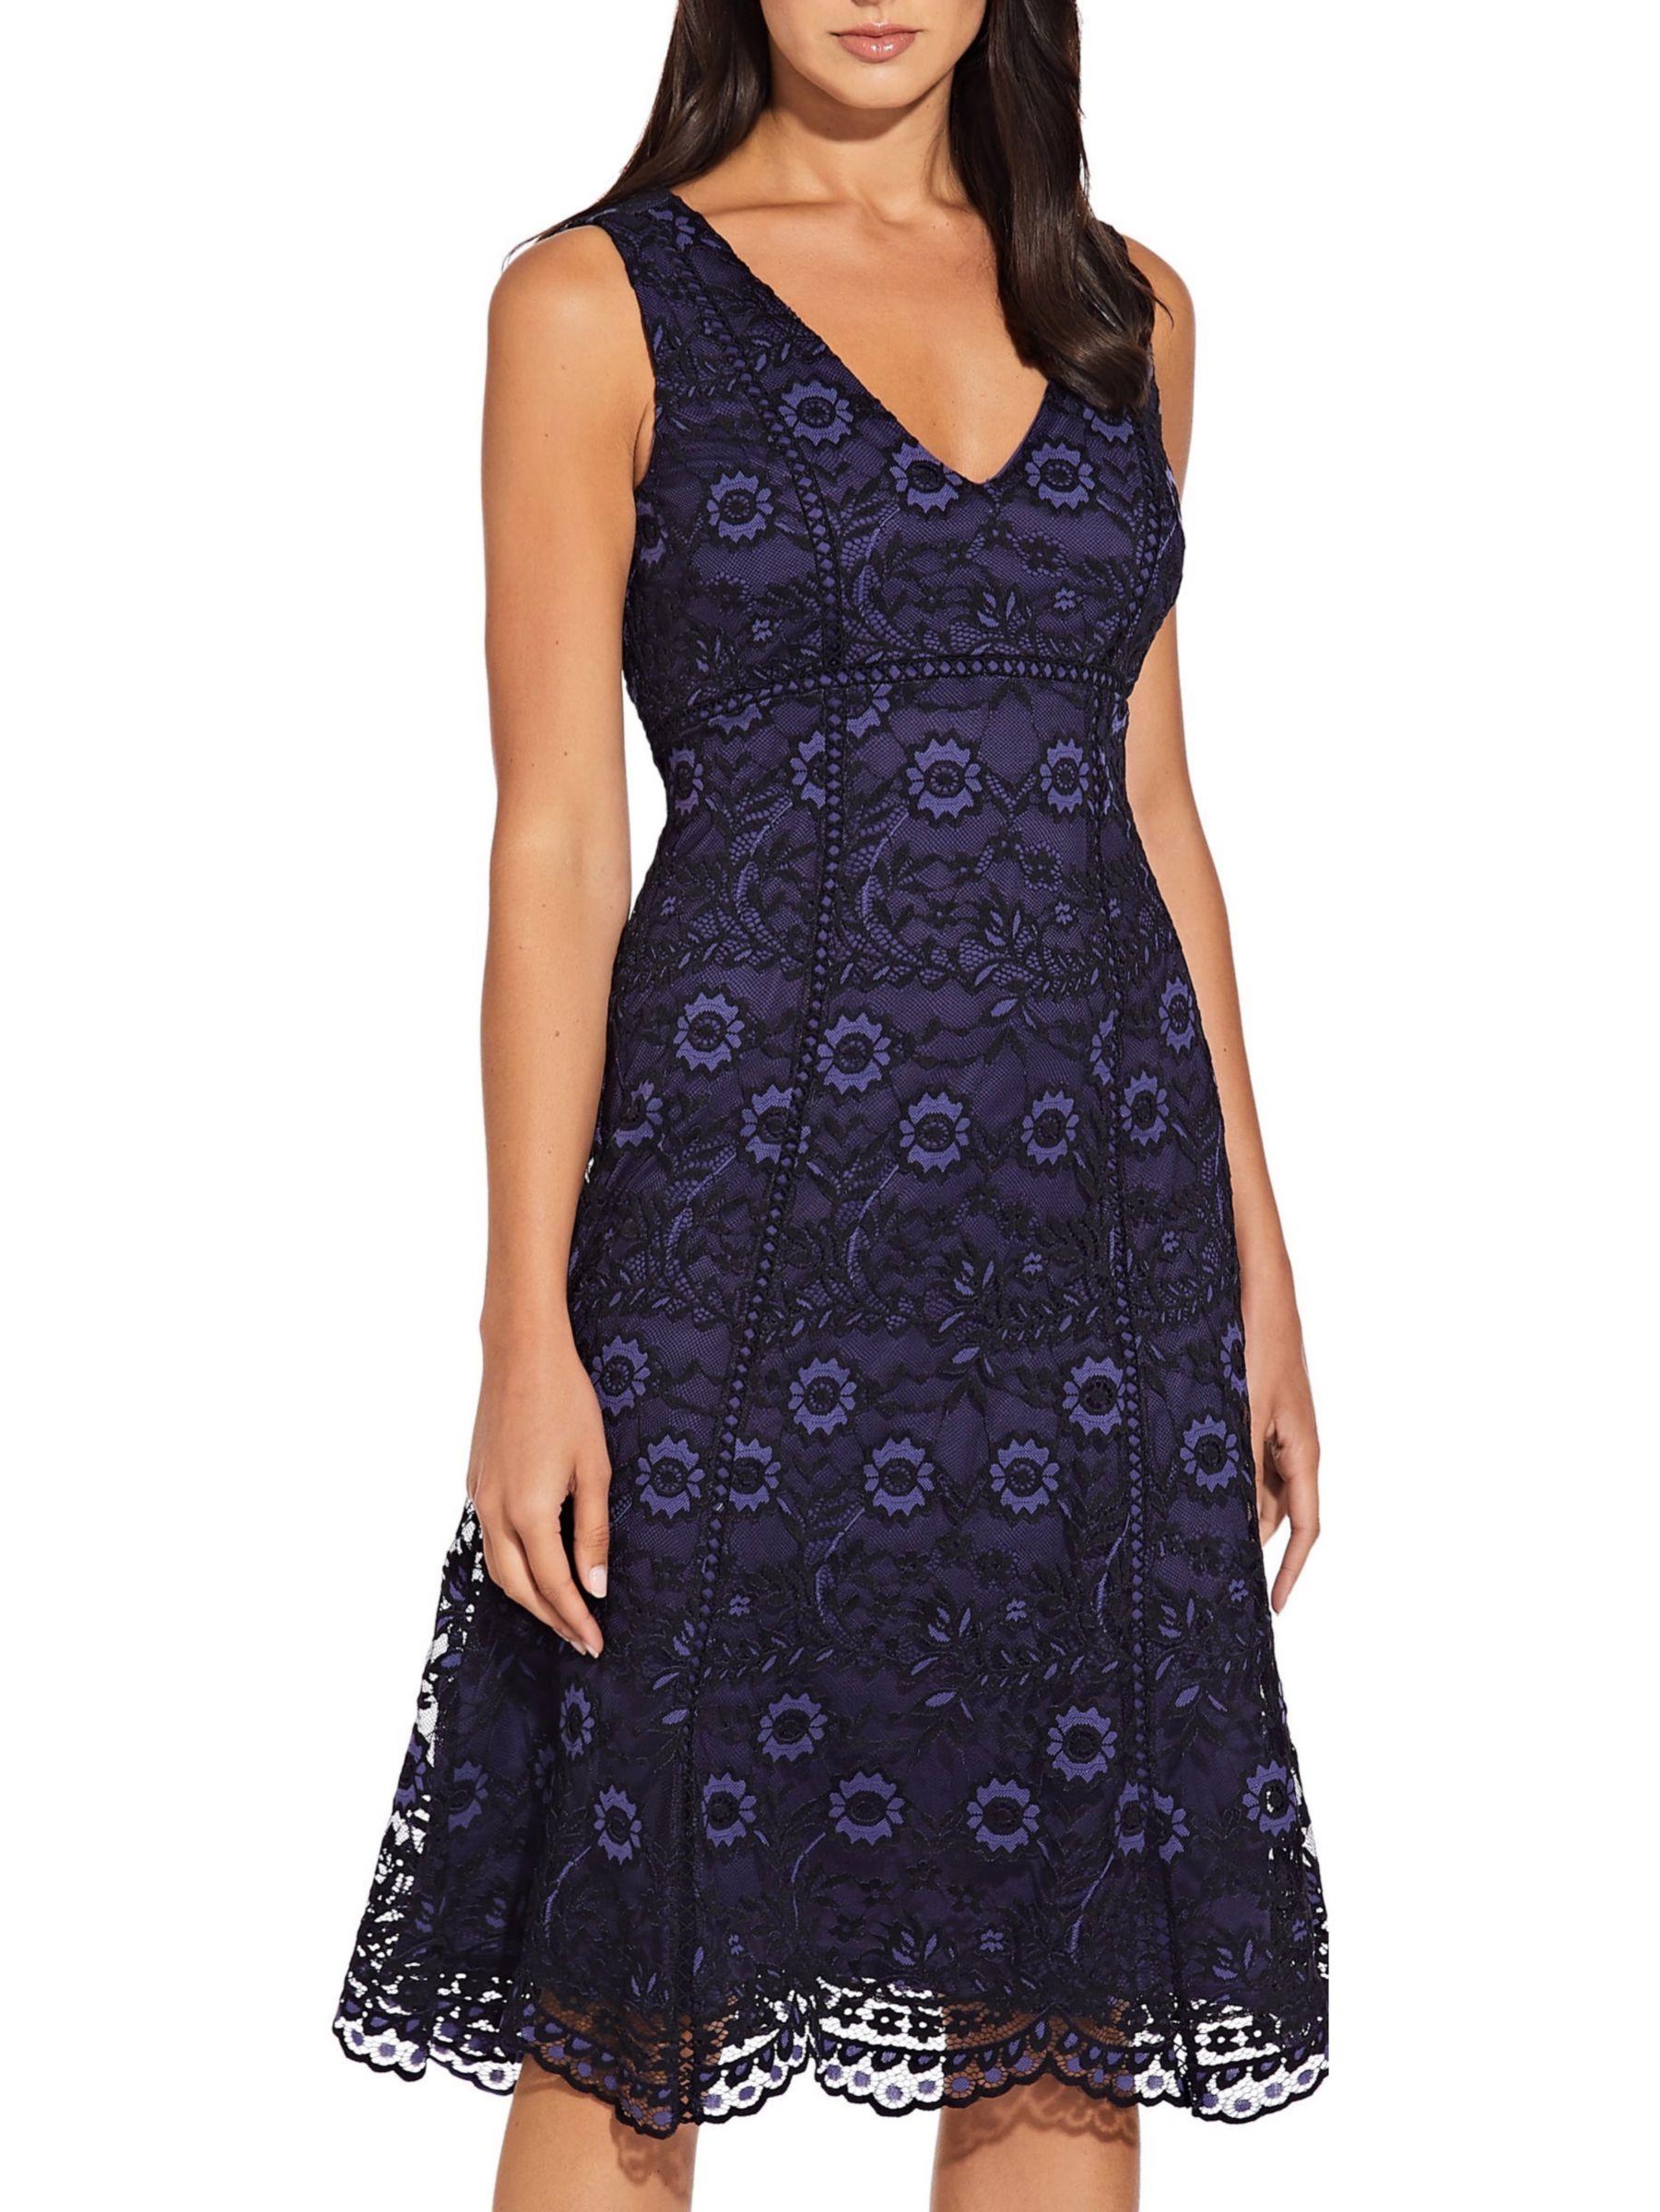 Adrianna Papell Adrianna Papell Natalia Lace A Line Midi Dress, Navy/Black